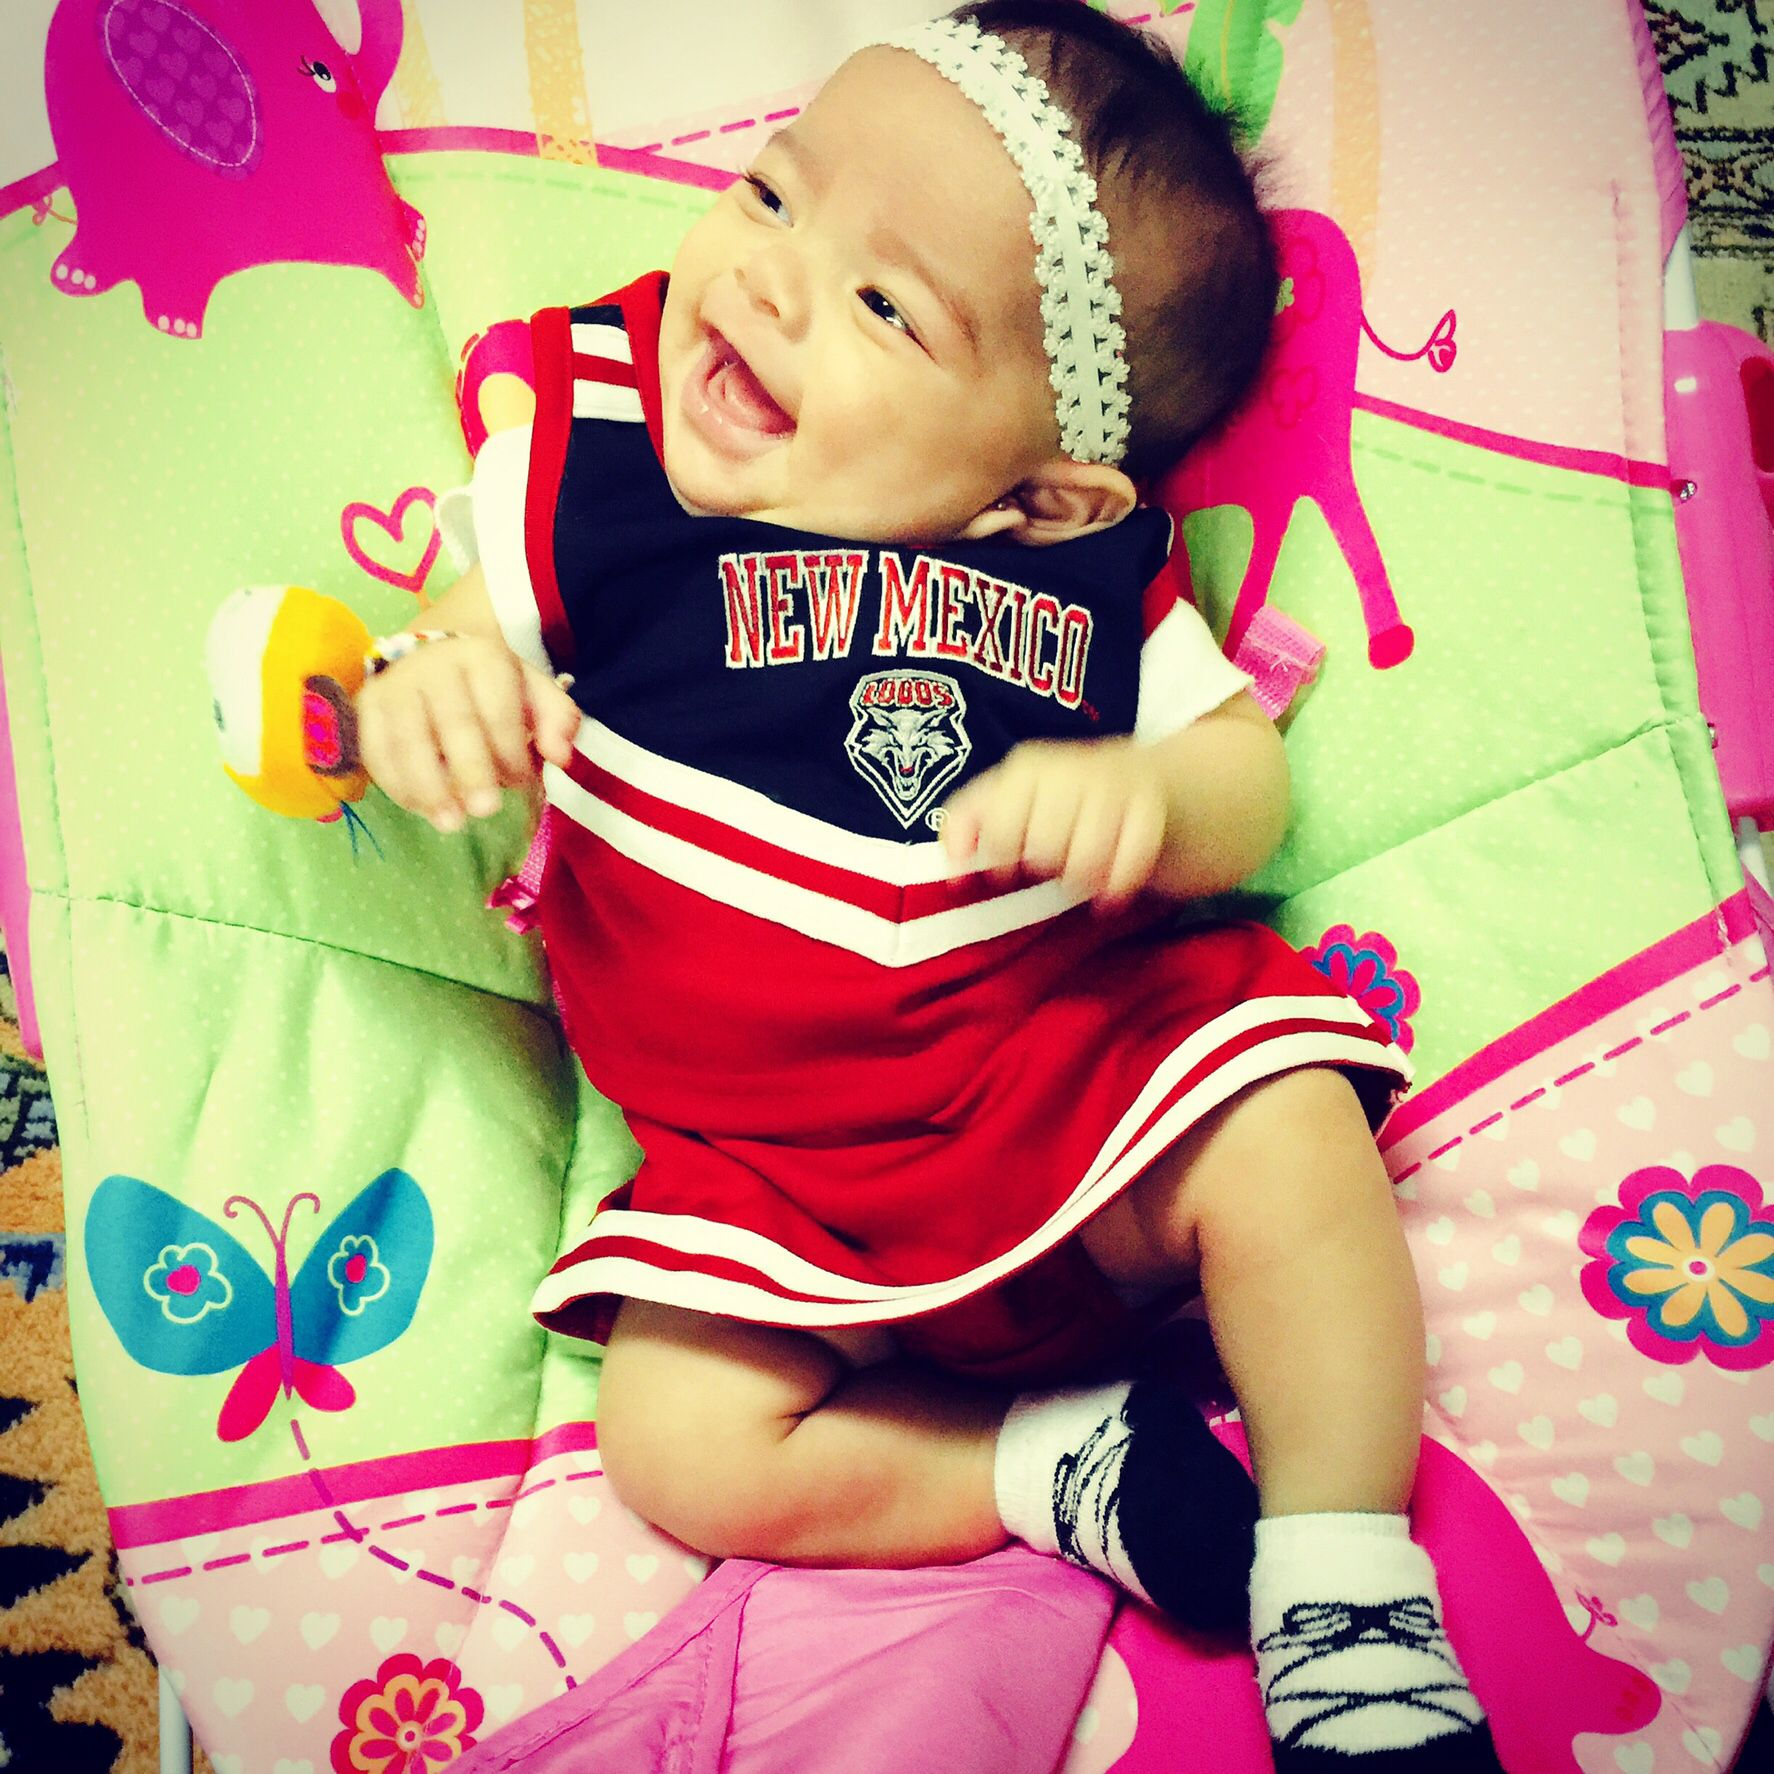 Unm Lobos Cheer Uniform With Images Cheer Uniform Baby Face